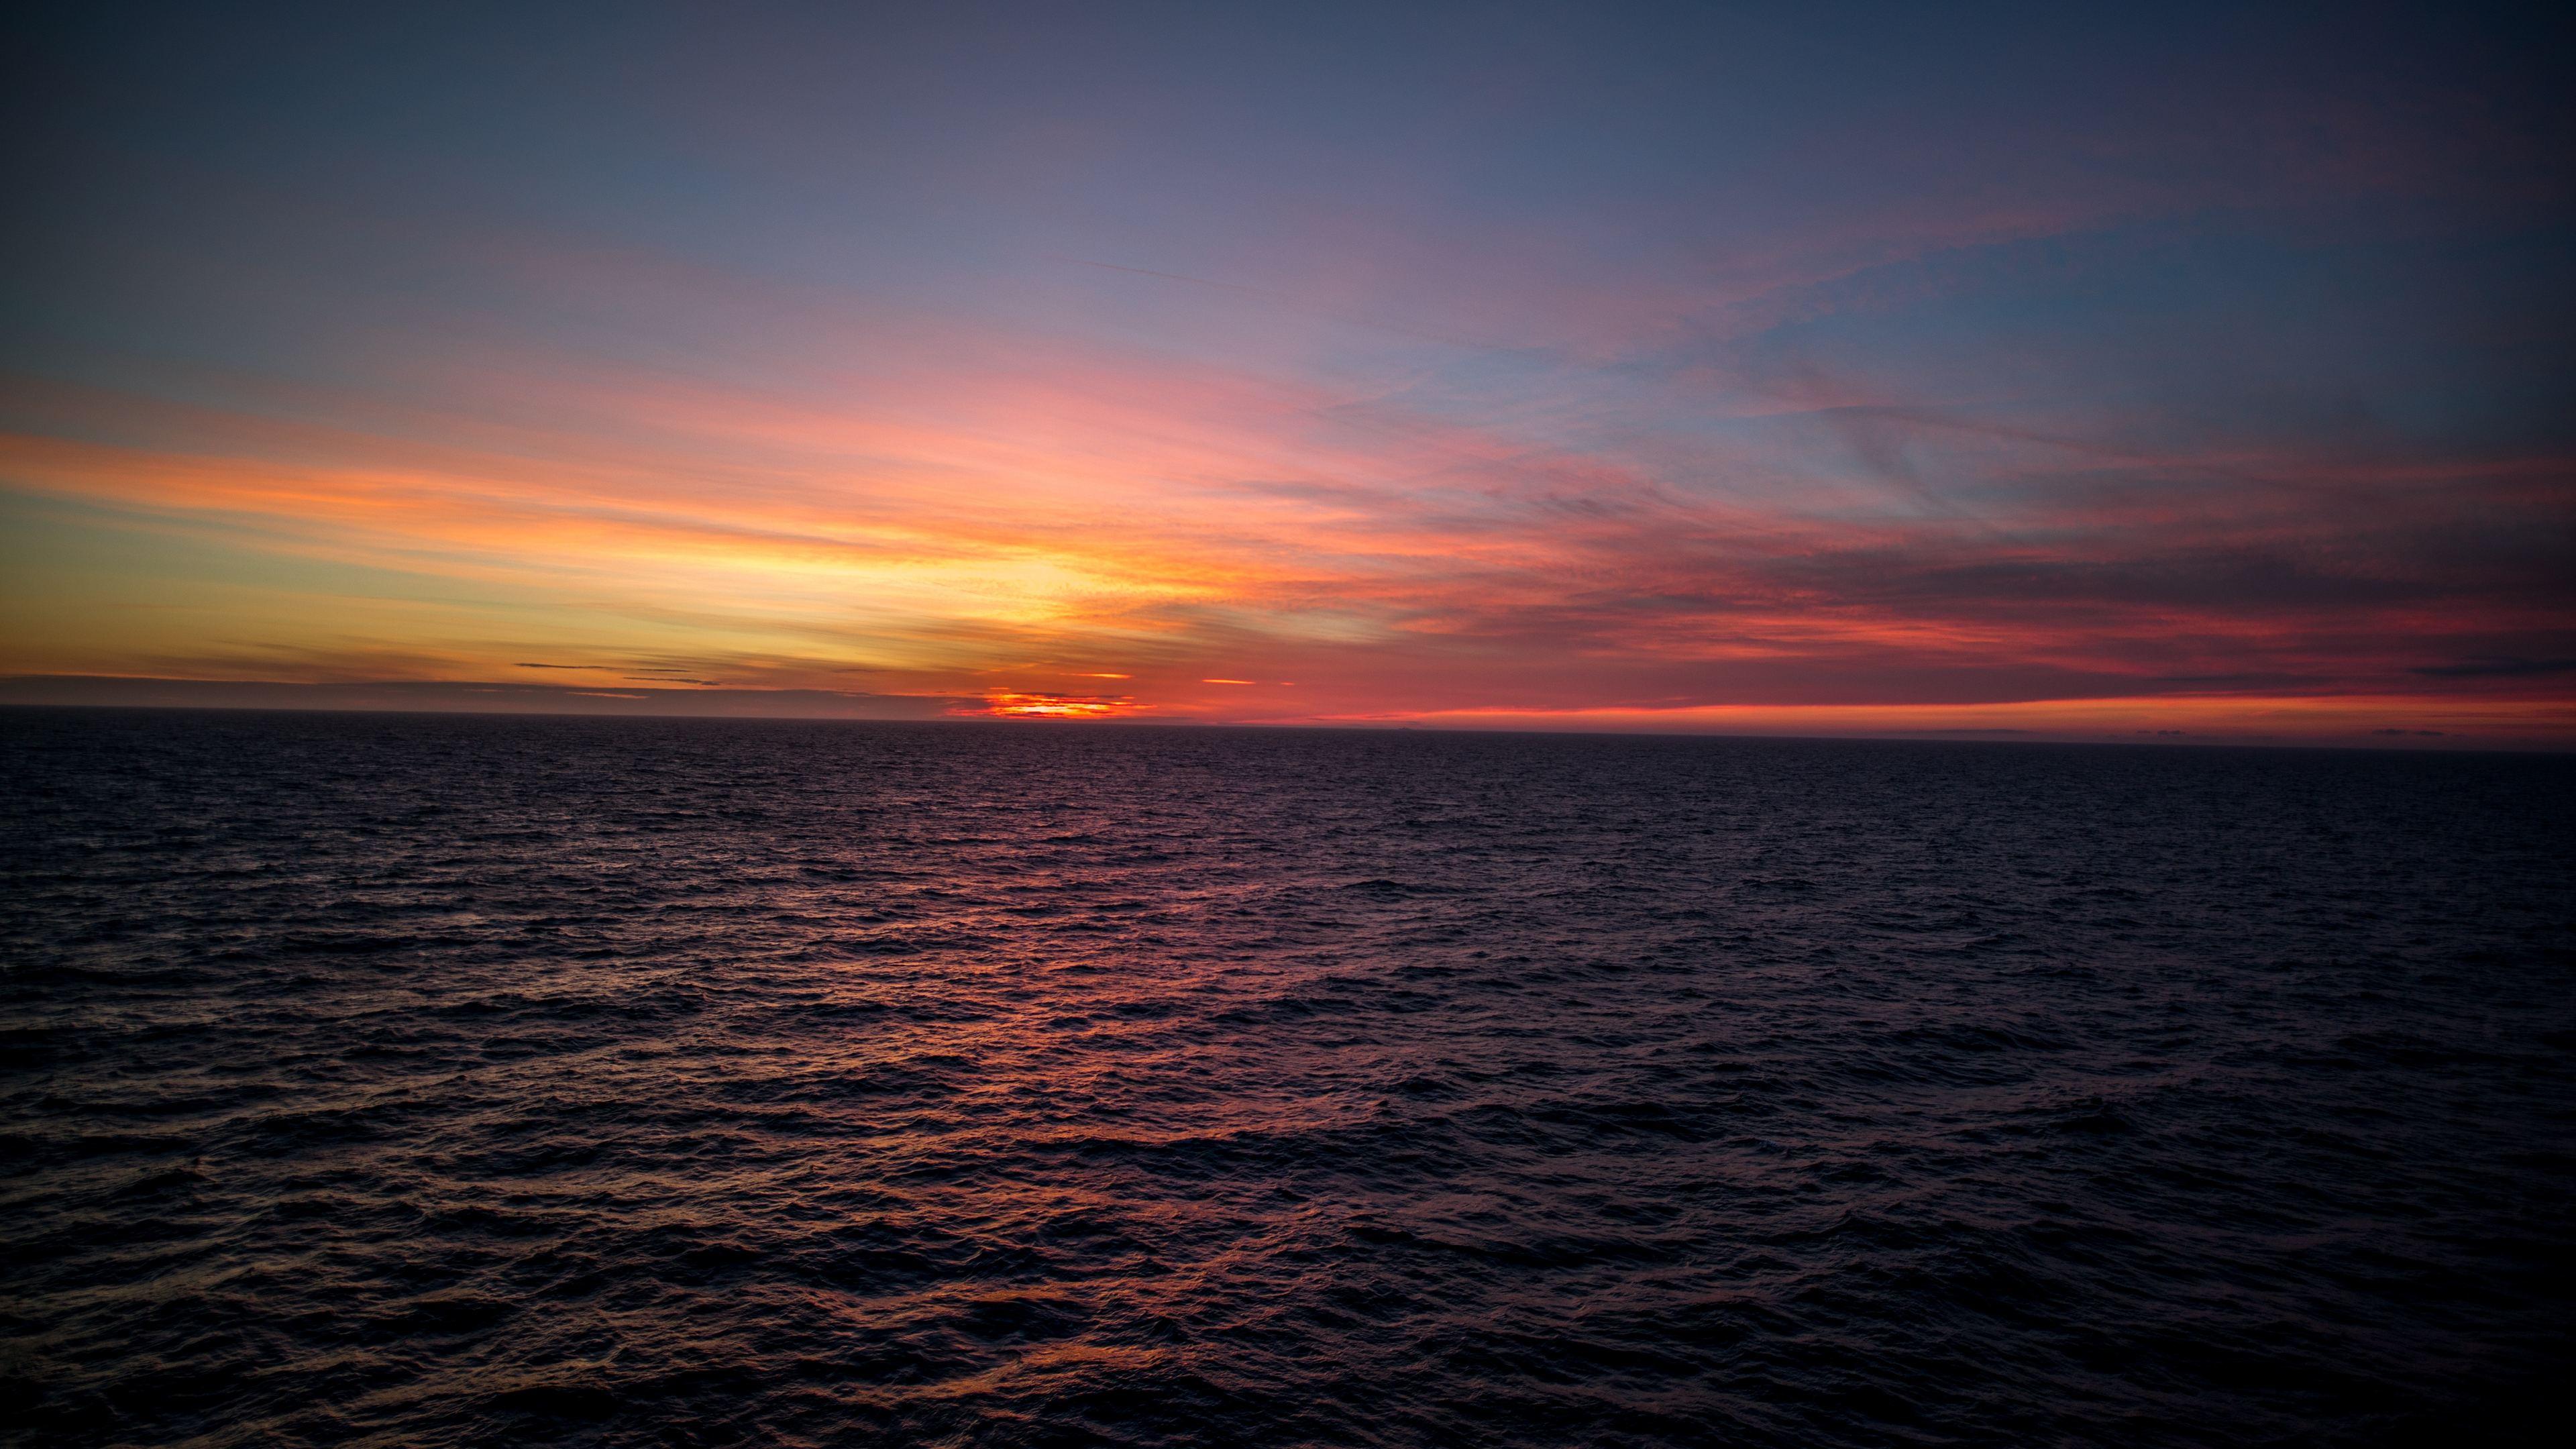 silent ocean sunset 4k 1551643676 - Silent Ocean Sunset 4k - sunset wallpapers, sky wallpapers, ocean wallpapers, nature wallpapers, hd-wallpapers, 4k-wallpapers